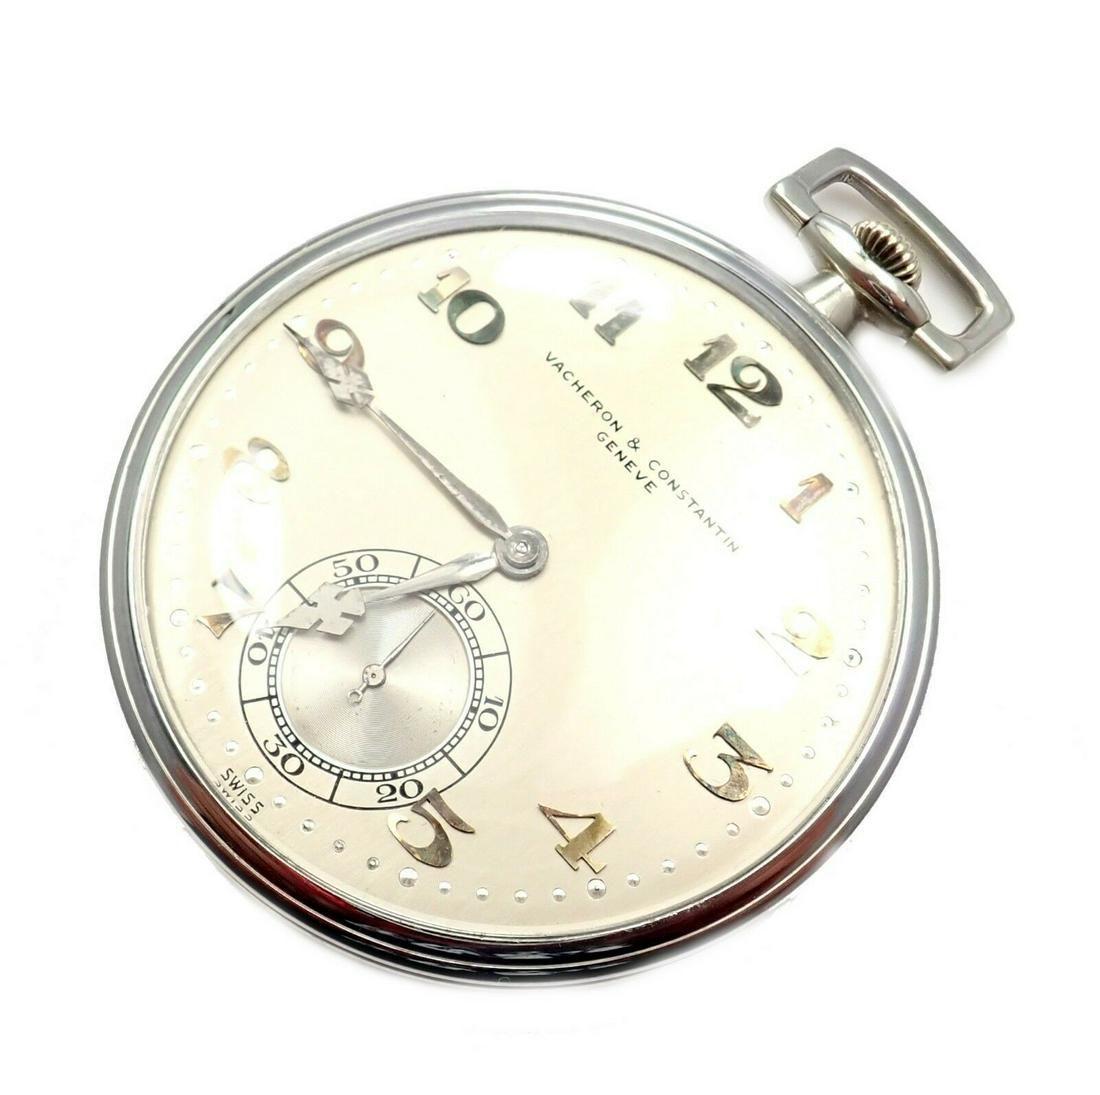 Vacheron Constantin 18K White Gold Pocket Watch 18J